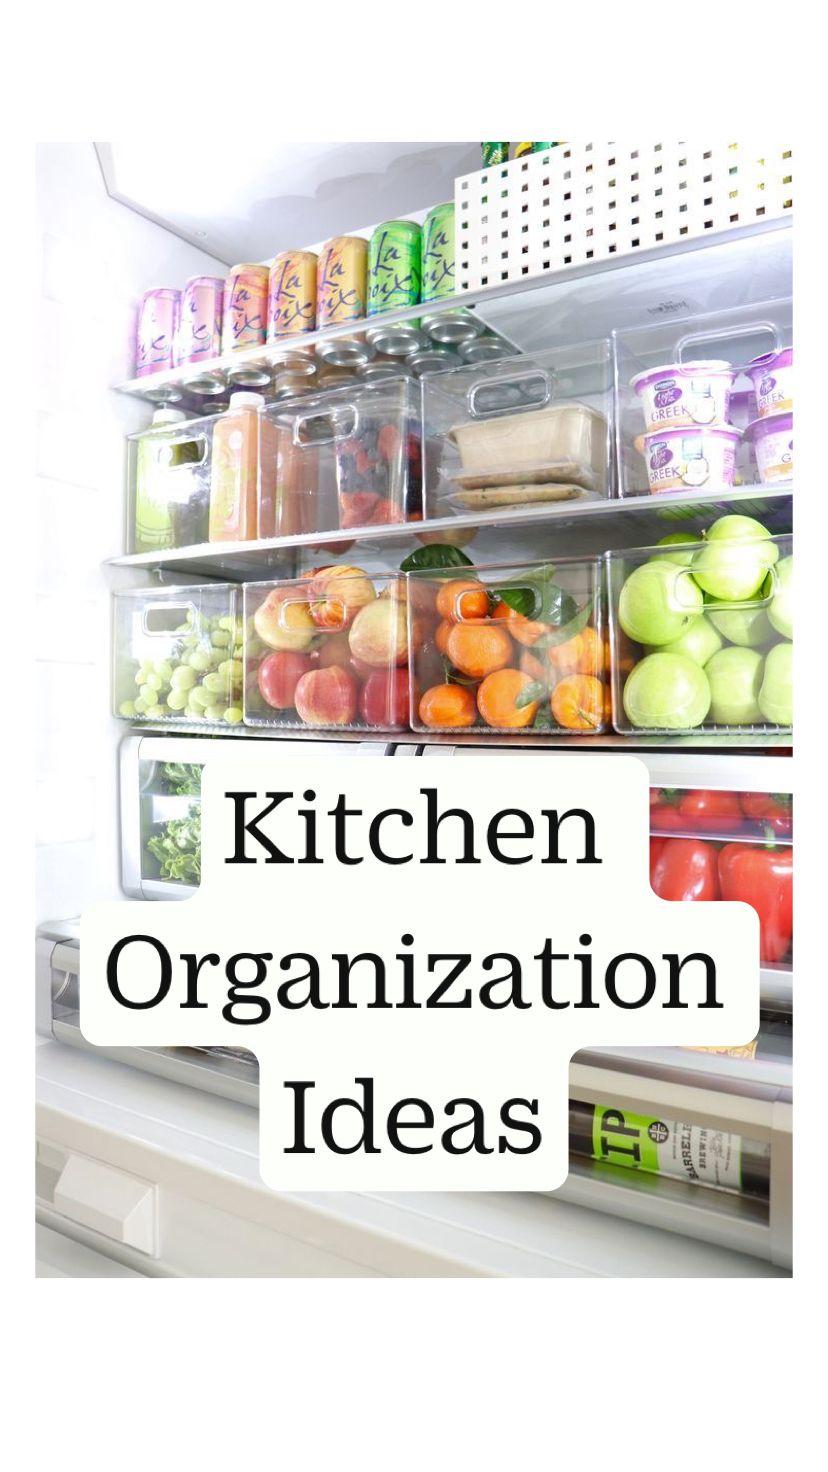 How to OrganizeYourRefrigerator